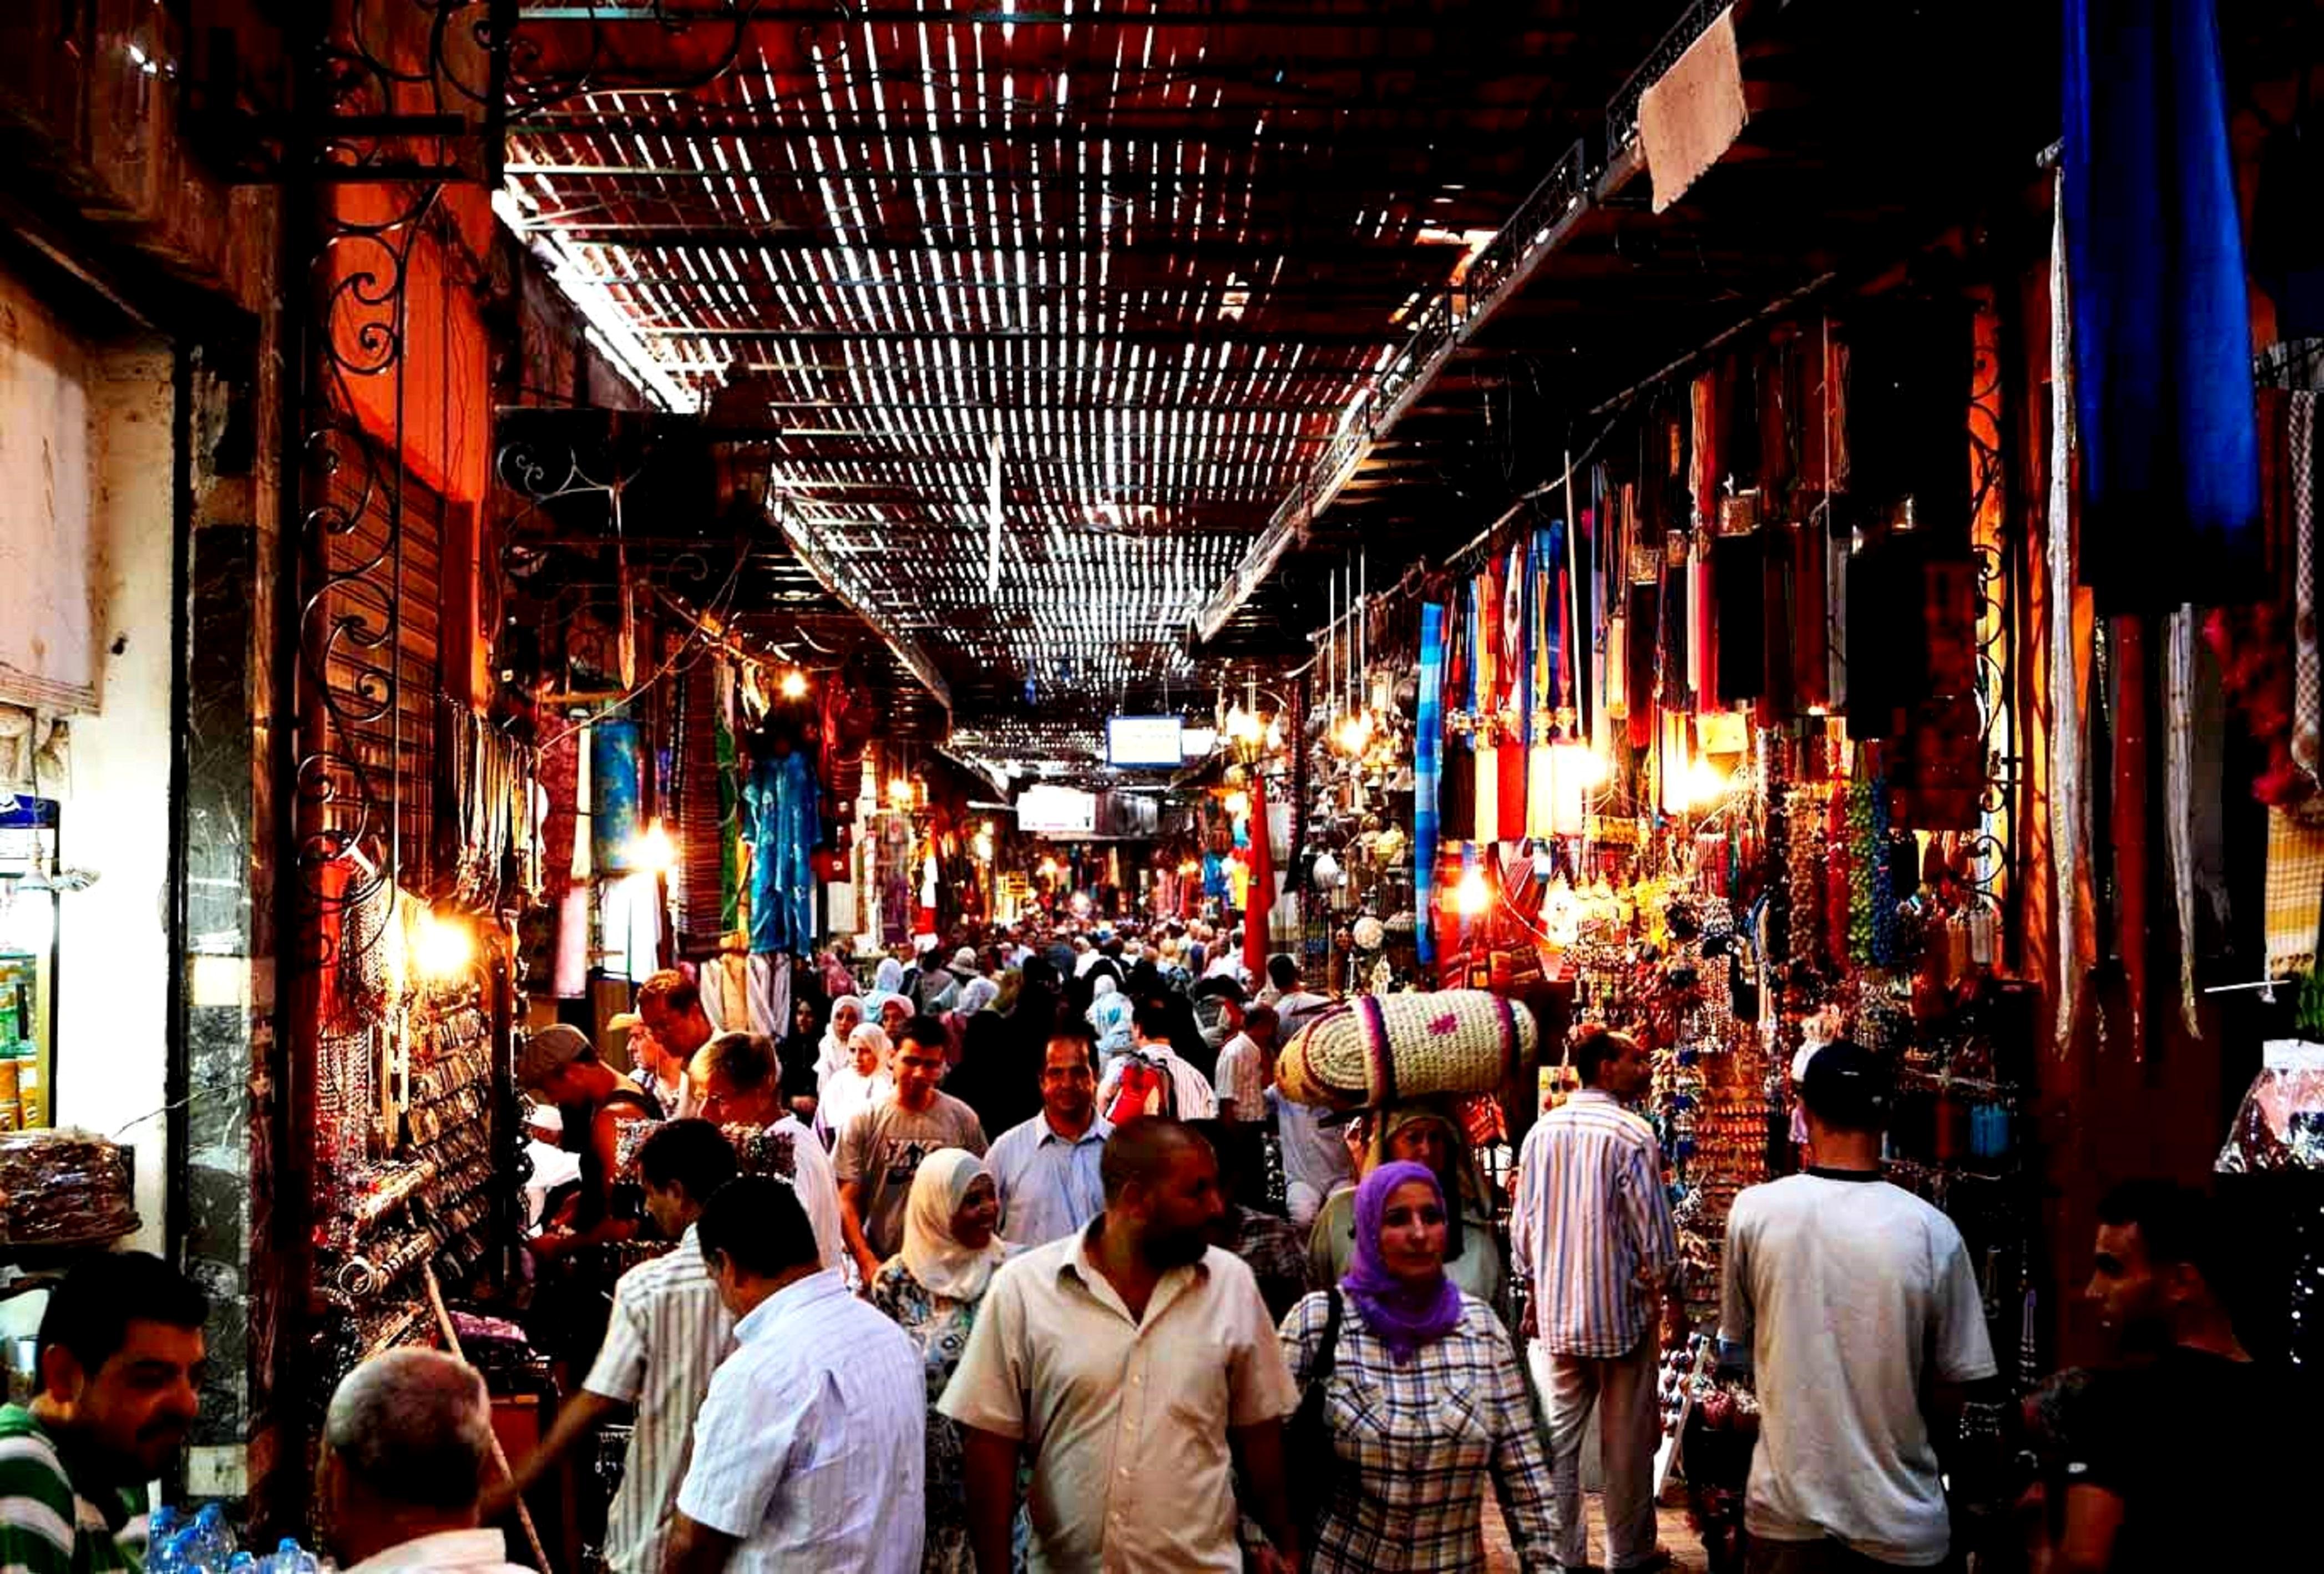 Marrakech - Suq